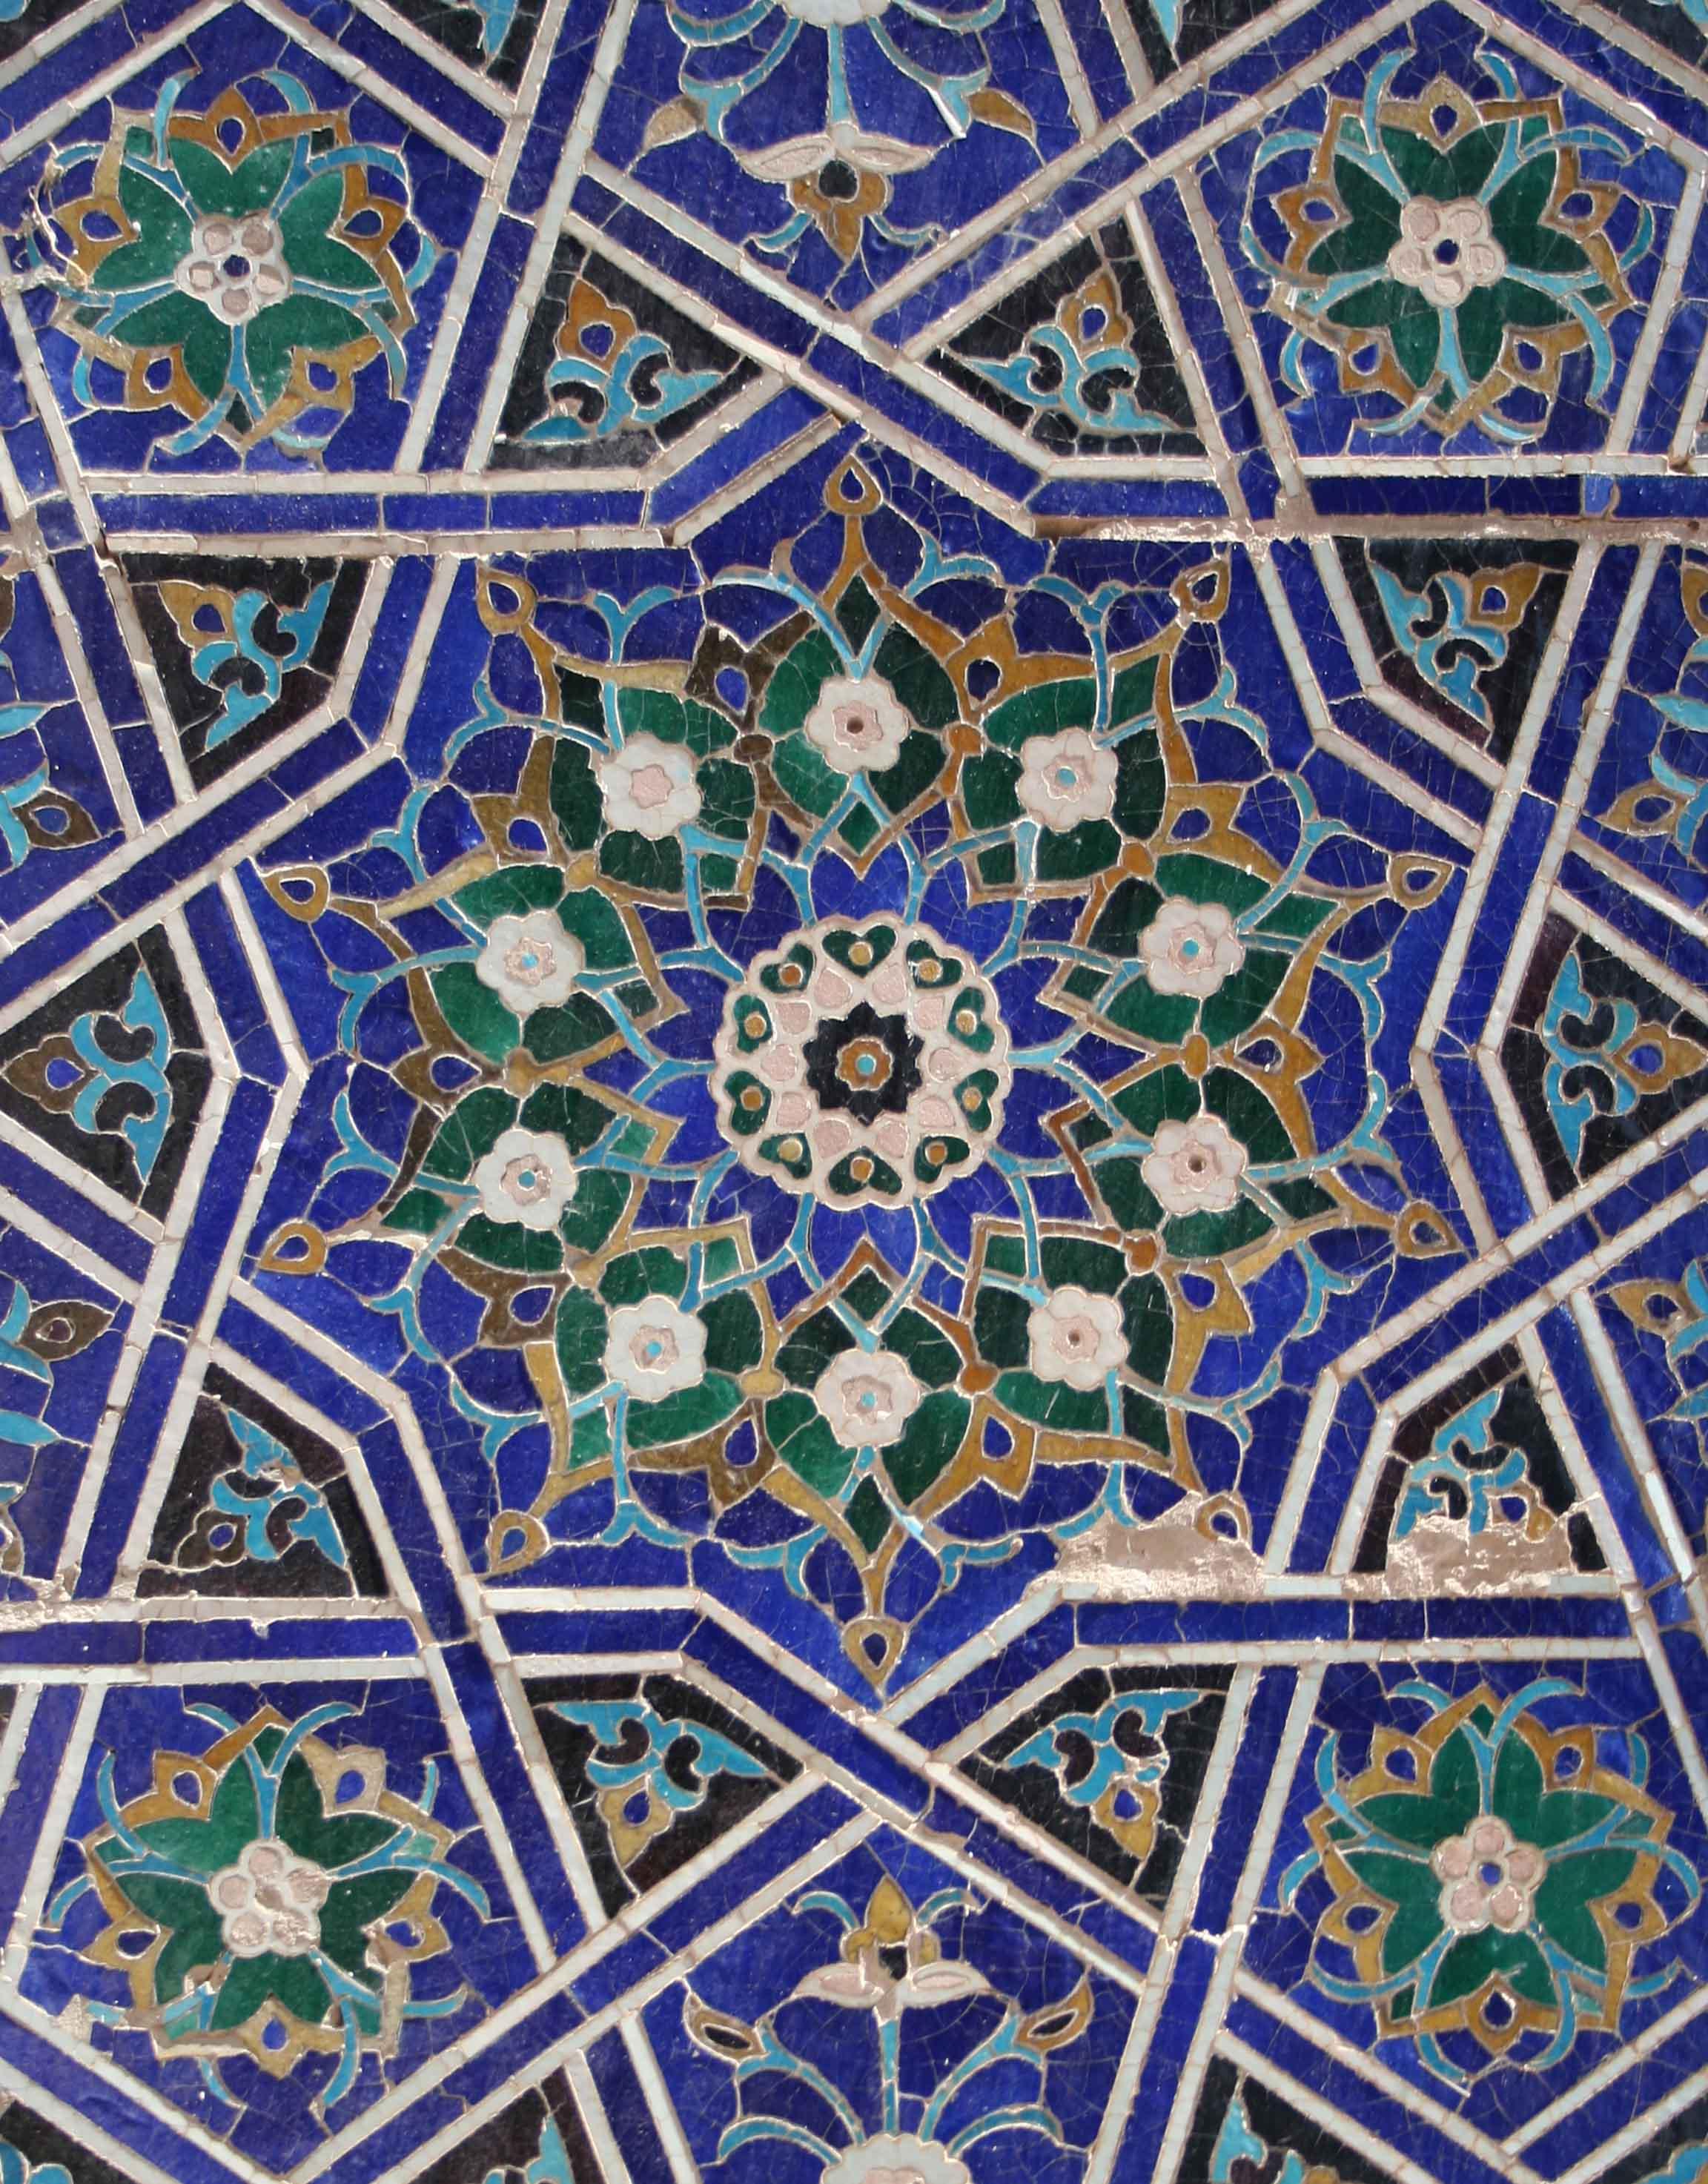 Siadqt furthermore  together with Samarkand Shah I Zinda Tuman Aqa  plex Cropped further Ab A B A B F likewise Fibonacci Art Project X. on creative tessellations